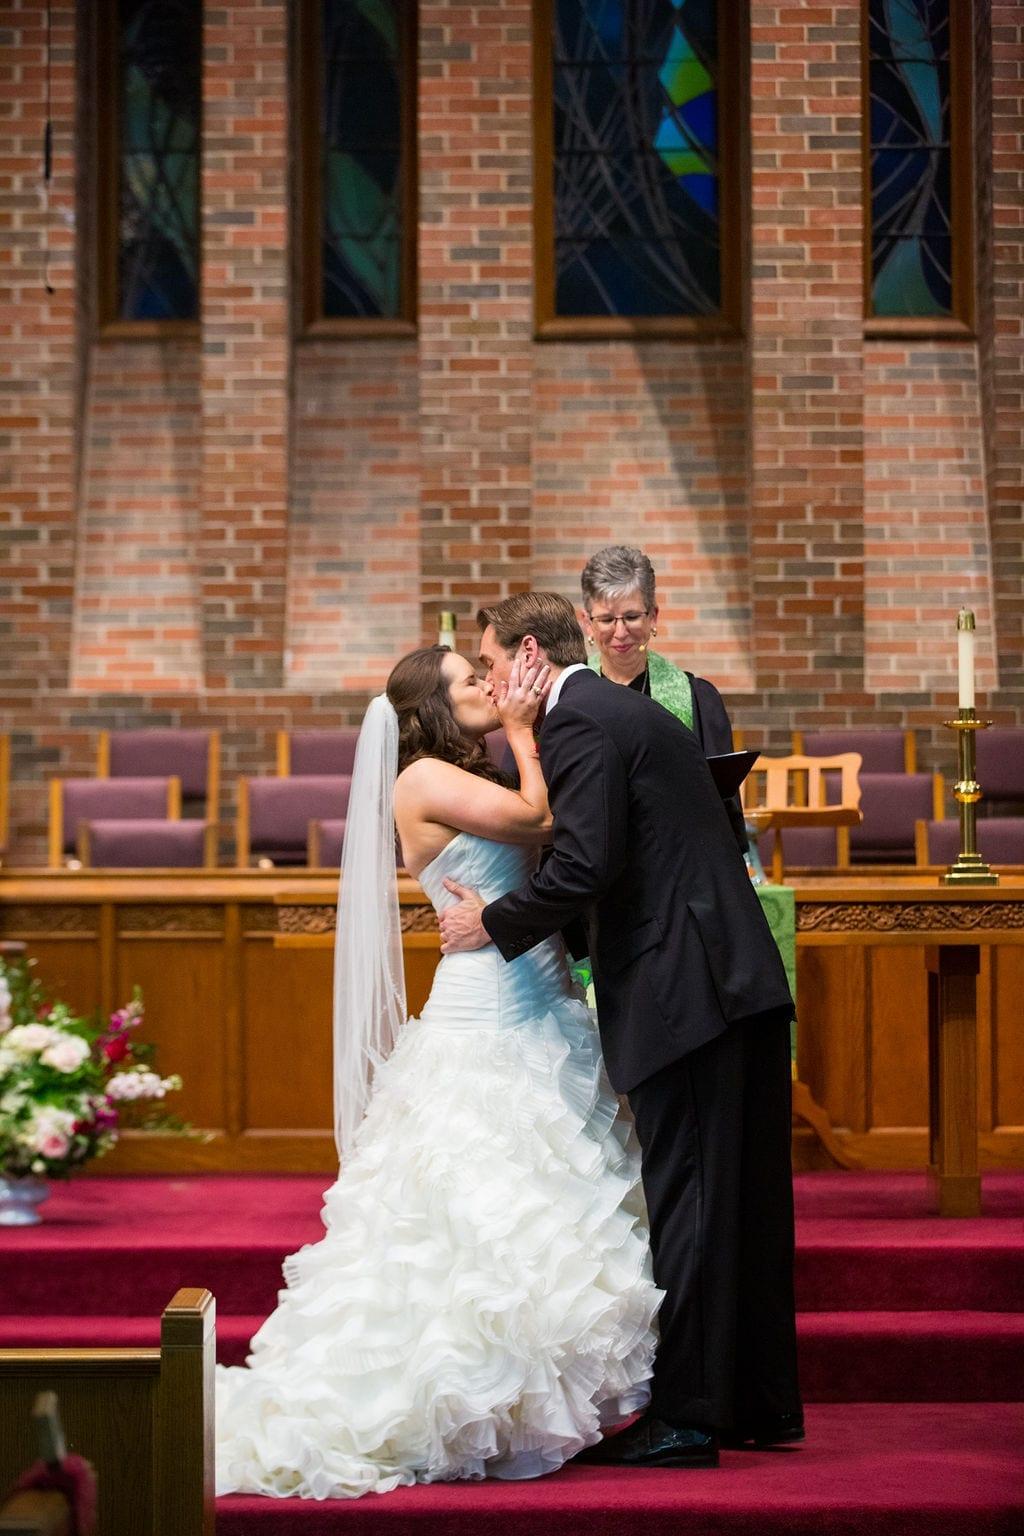 Ashley - Josh's wedding ceremony kiss